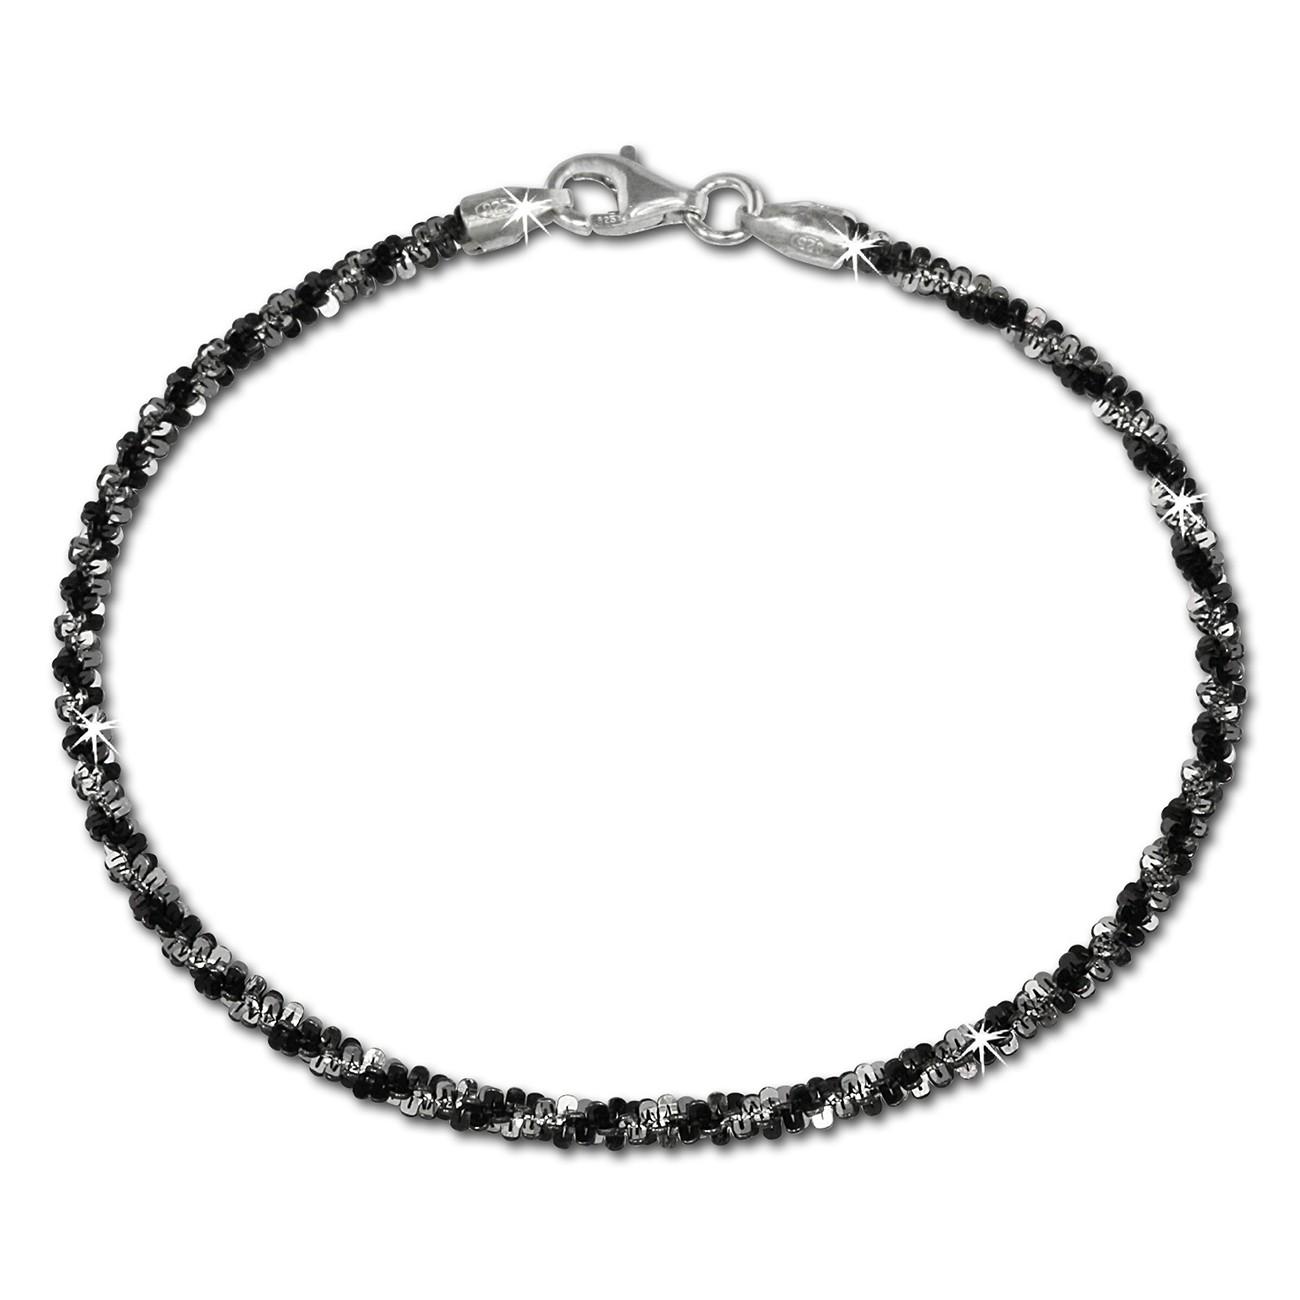 SilberDream Armband gedreht schwarz 21cm 925 Silber Damen SDA2031S